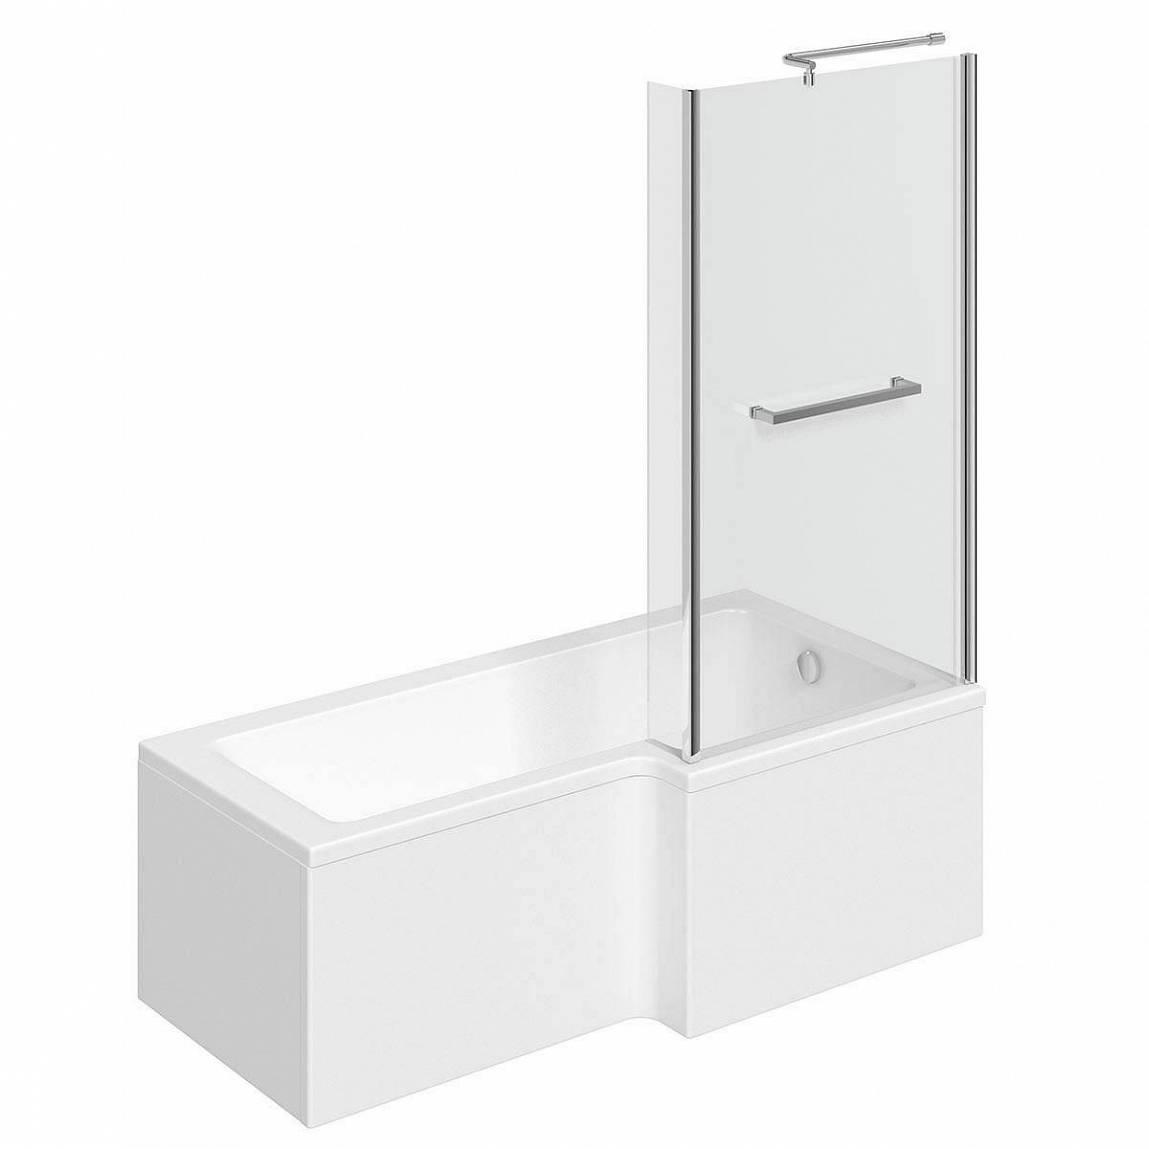 Image of Boston Shower Bath 1700 x 850 RH inc. Screen & Towel Rail